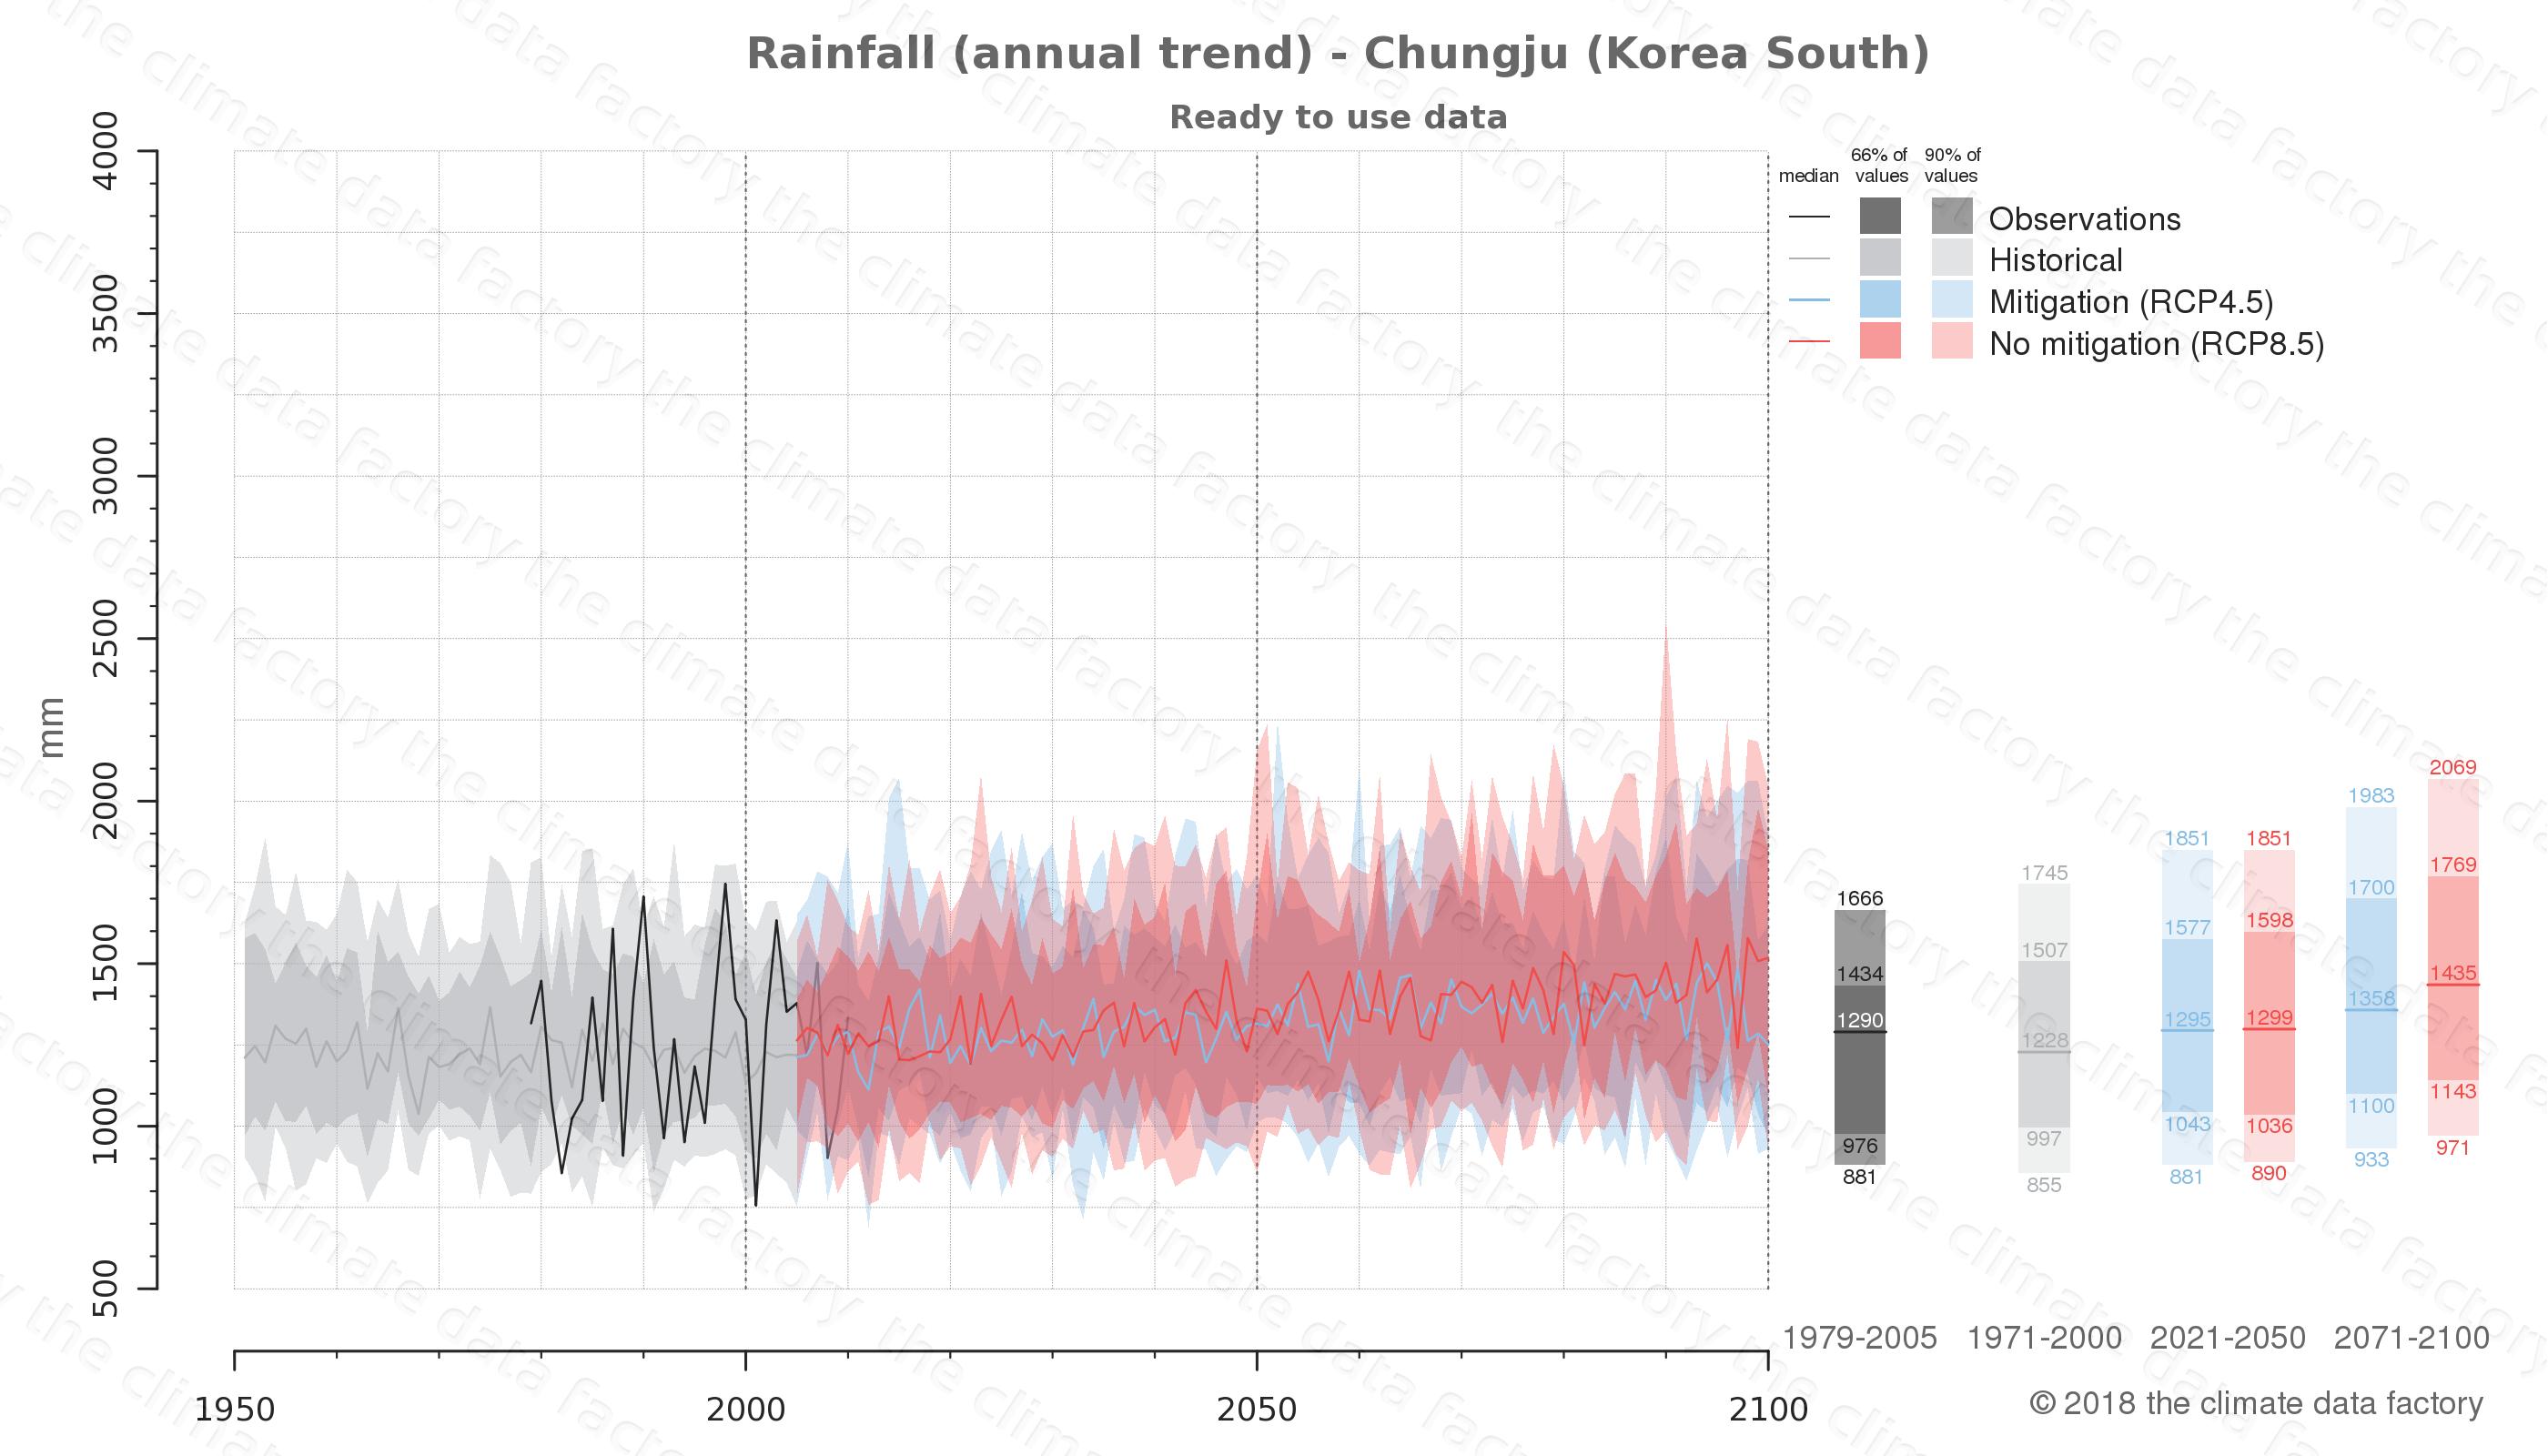 climate change data policy adaptation climate graph city data rainfall chungju south korea